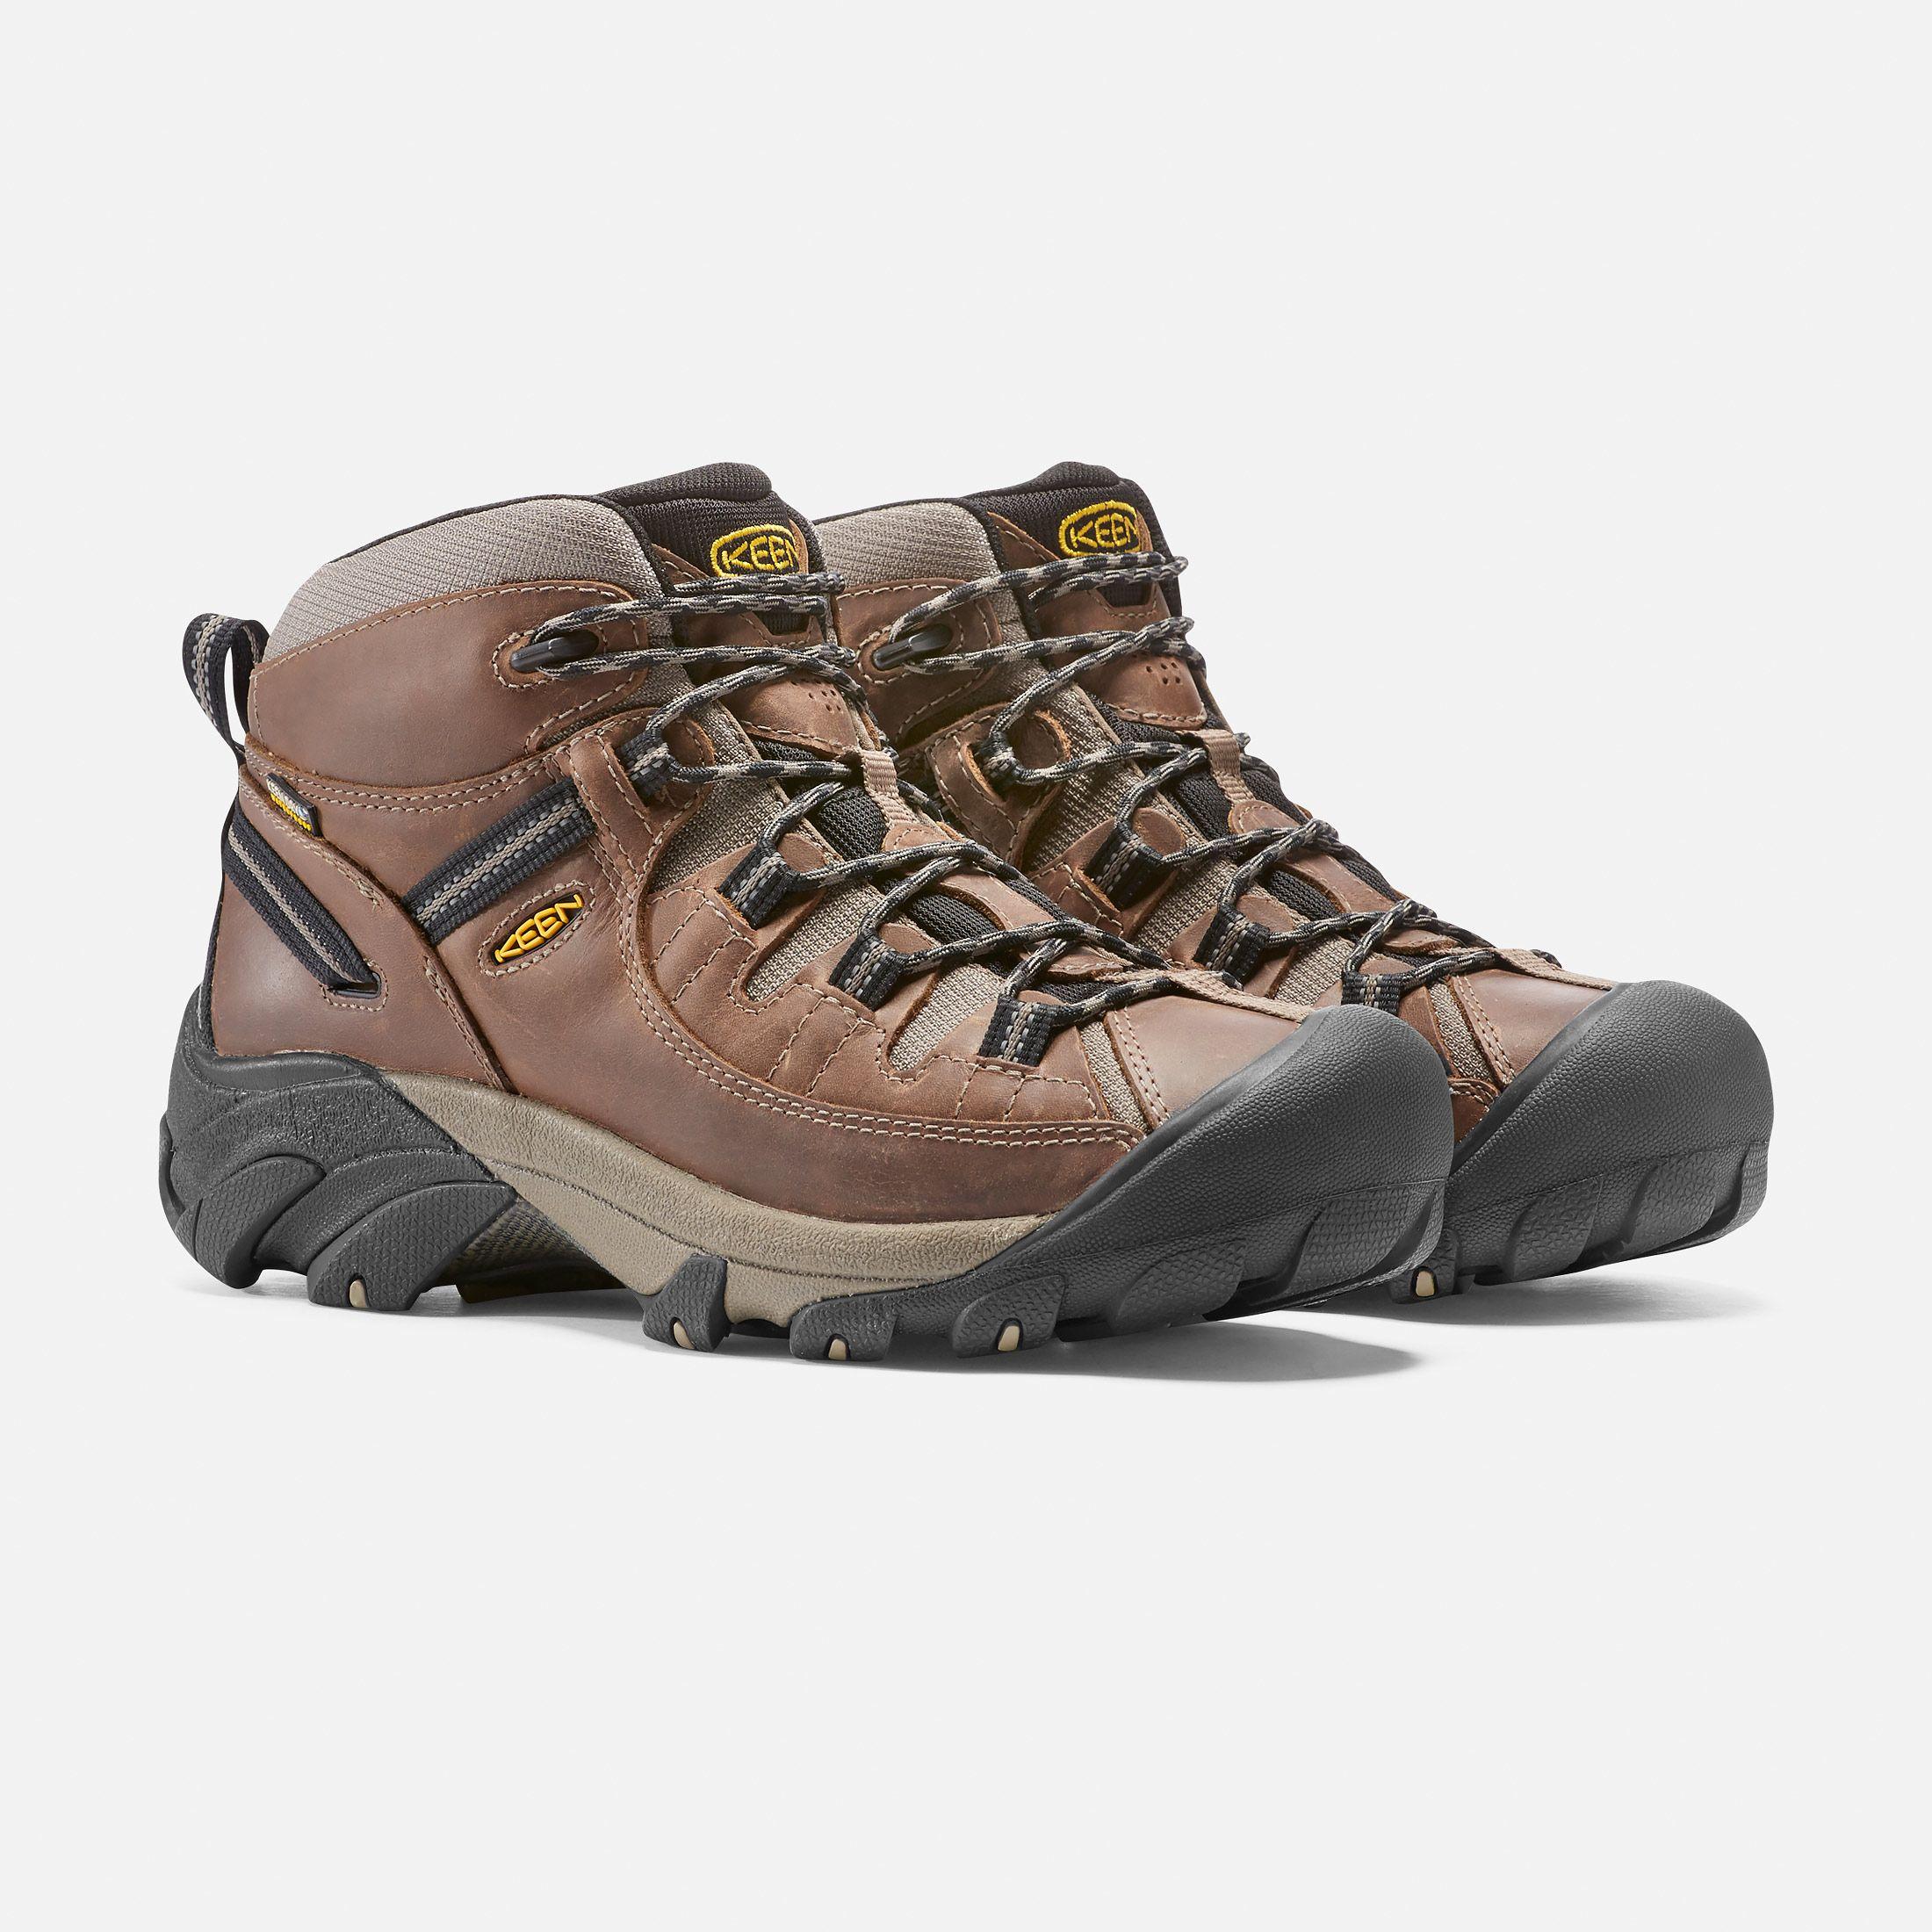 Keen Men S Waterproof Hiking Boots Targhee Ii Mid 10 Shitake